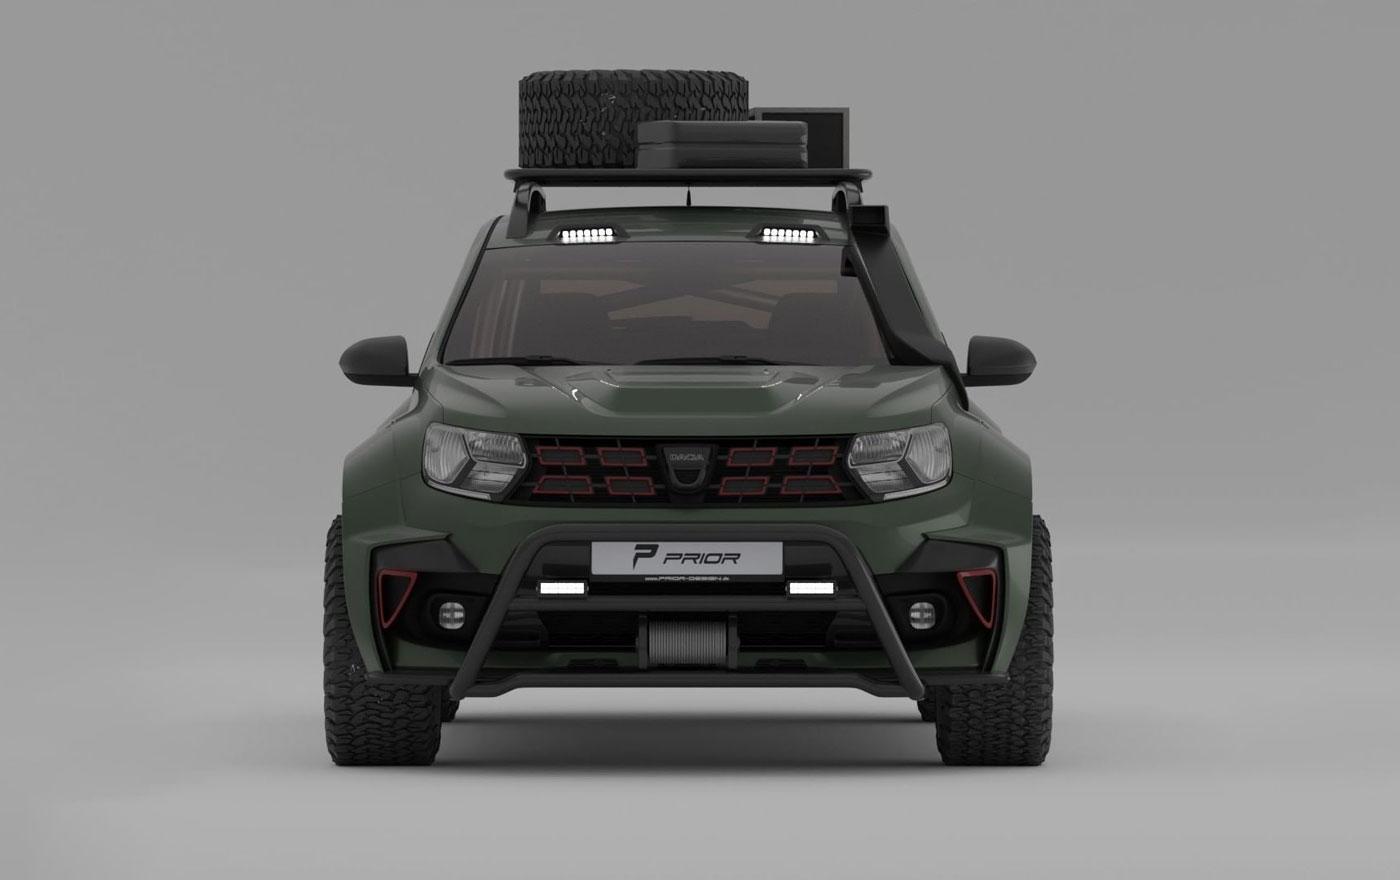 Dacia-Duster-Prior-Design-3